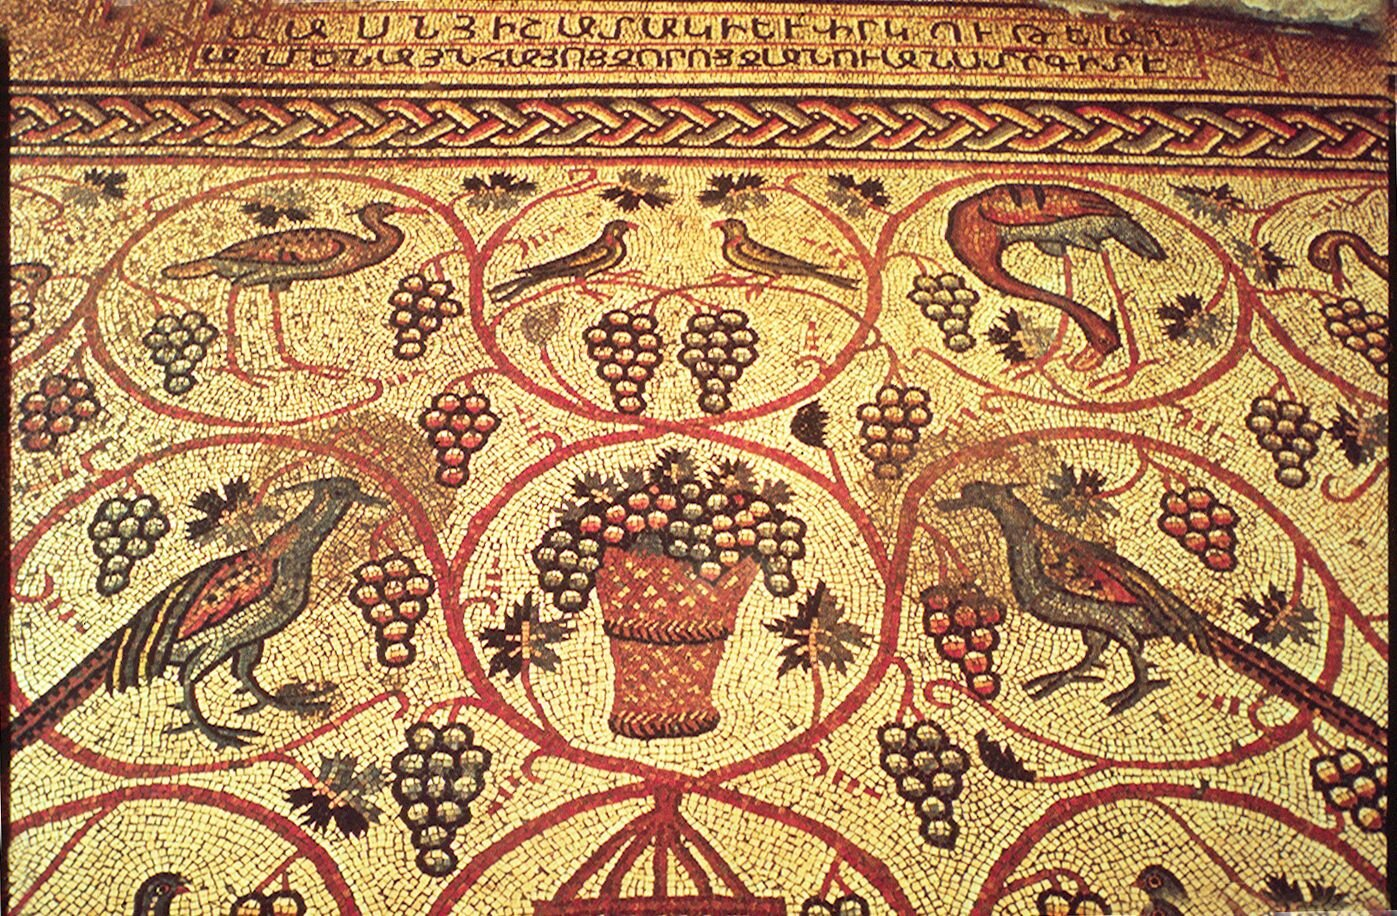 Mosaic with Armenian inscription at funerary chapel of St. Polyeuctos, Musara Quarter, Damascus Gate, Old Town of Jerusalem (Dickran Kouymjian, WikiCommons)